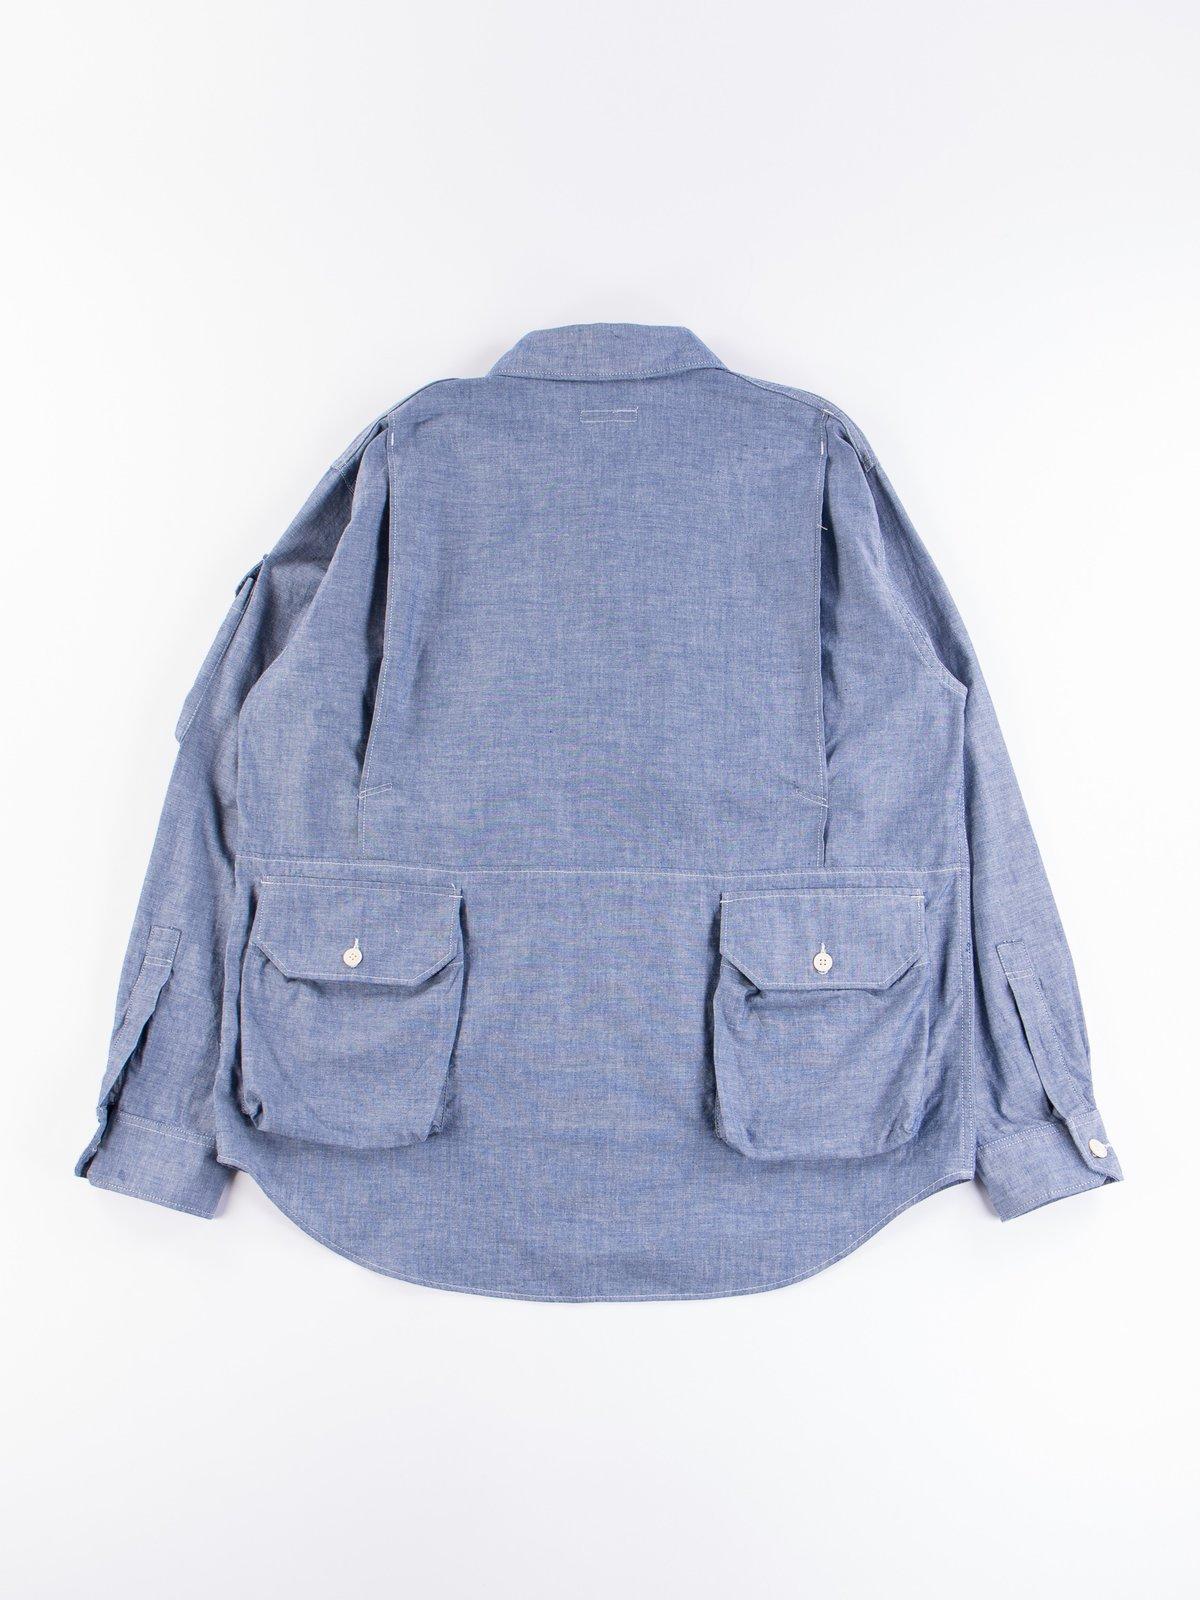 Blue Cotton Chambray Explorer Shirt Jacket - Image 7